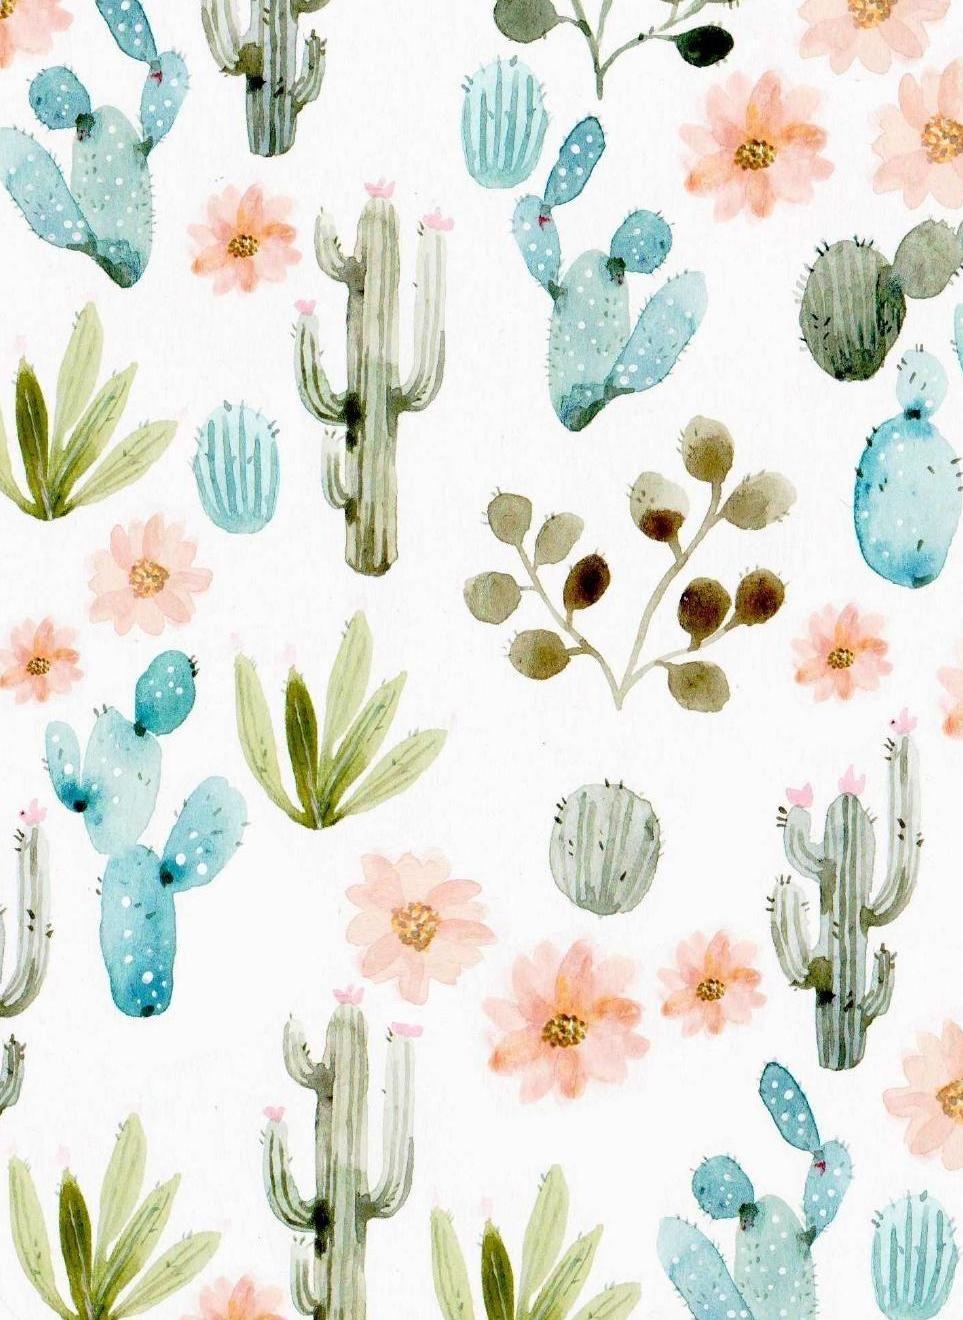 Une Semaine Sur Pinterest 32 Cacti Watercolor And Patterns